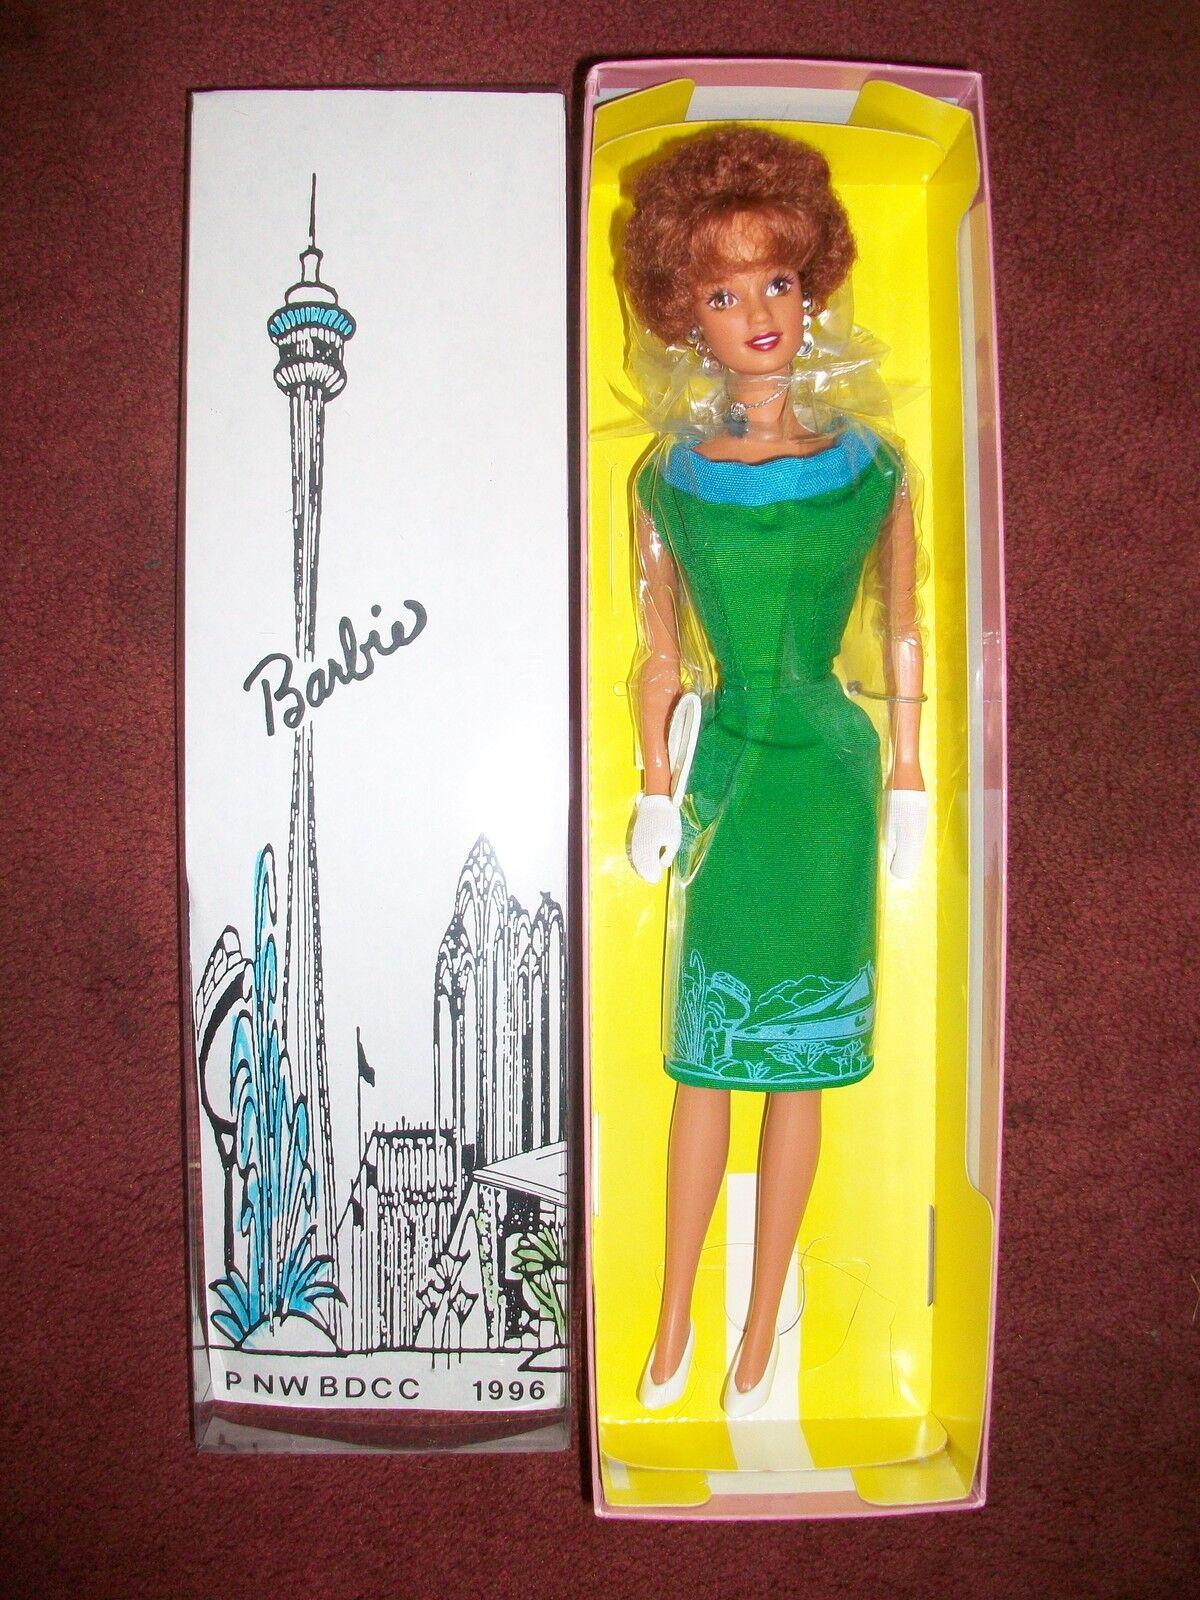 1996 P NW bdcc Colector Muñeca Barbie Pelirroja Pacific Northwest